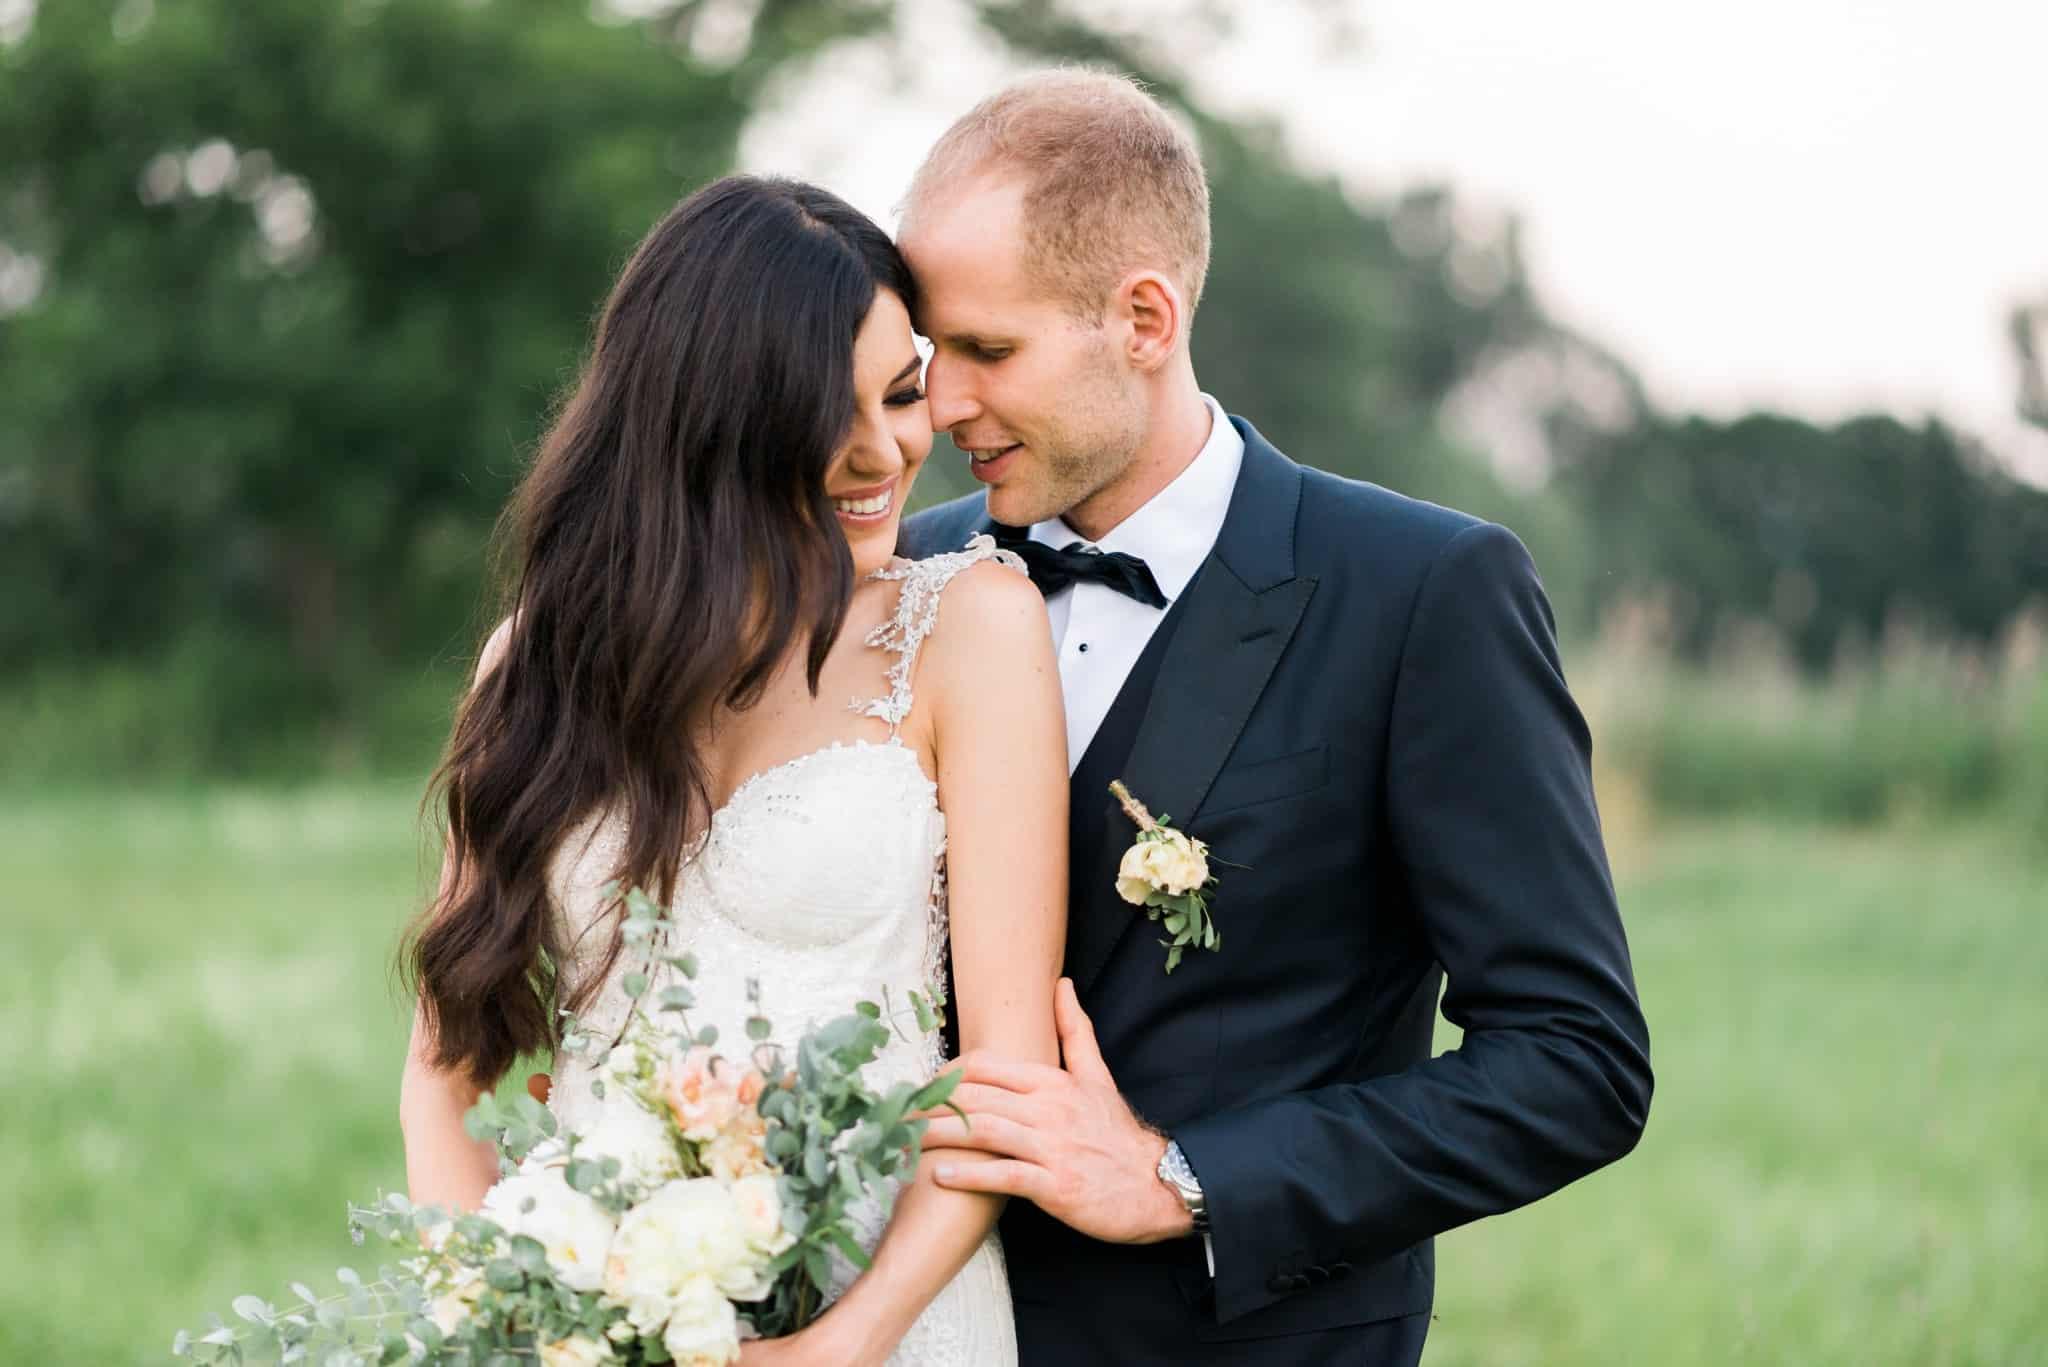 Wedoverhills_Prewedding_Hungary_Wedding_Photographer_0038